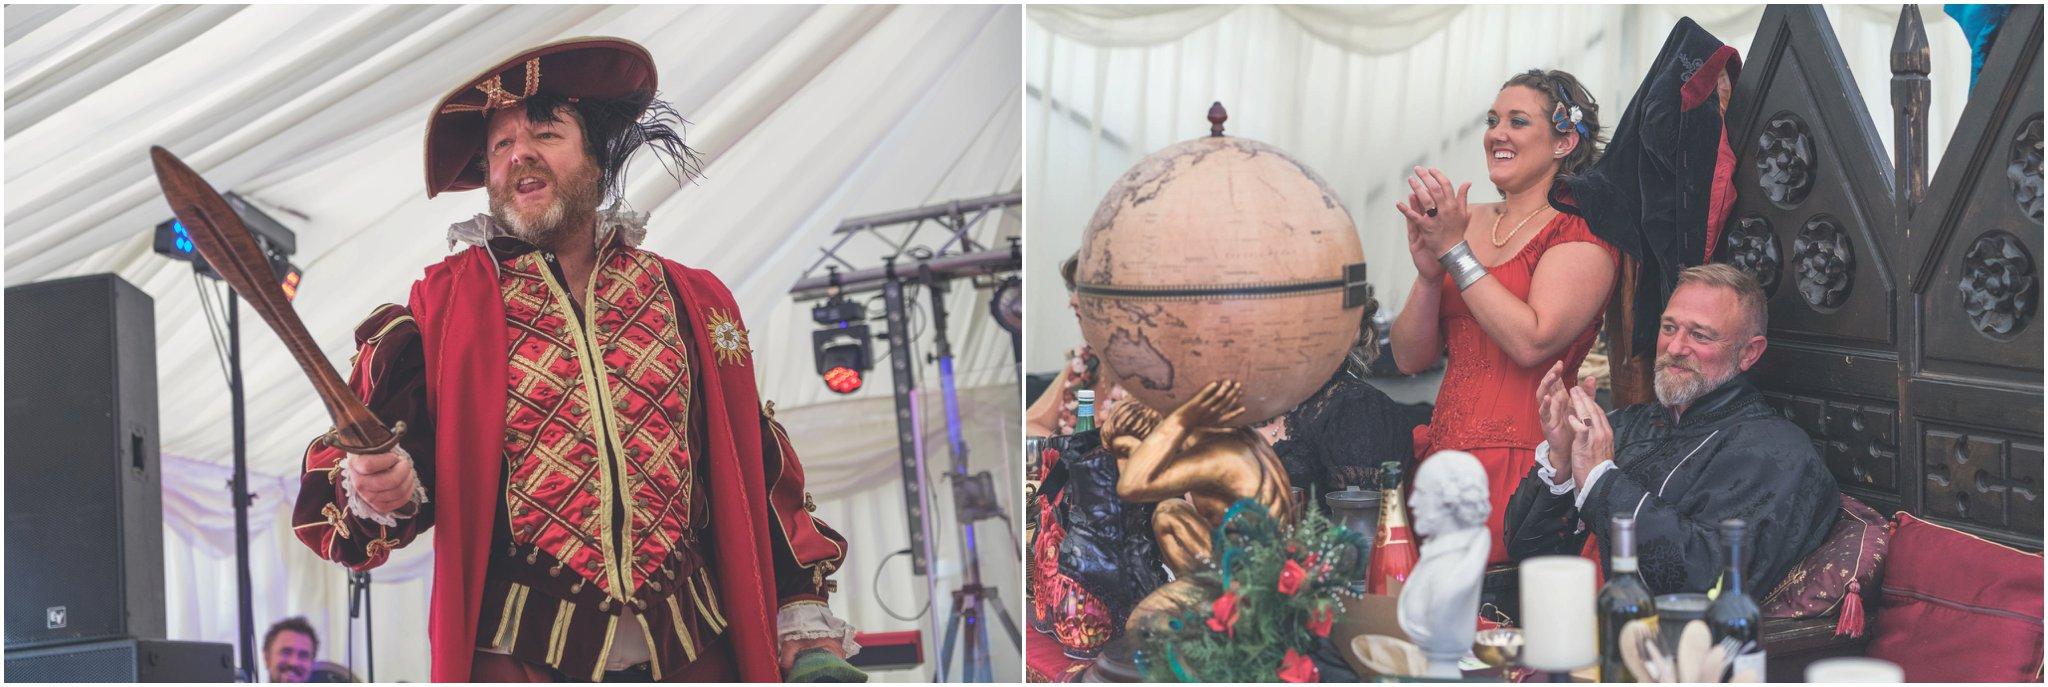 Stratford-Upon-Avon-Wedding - Robin Ball Photography-84.jpg